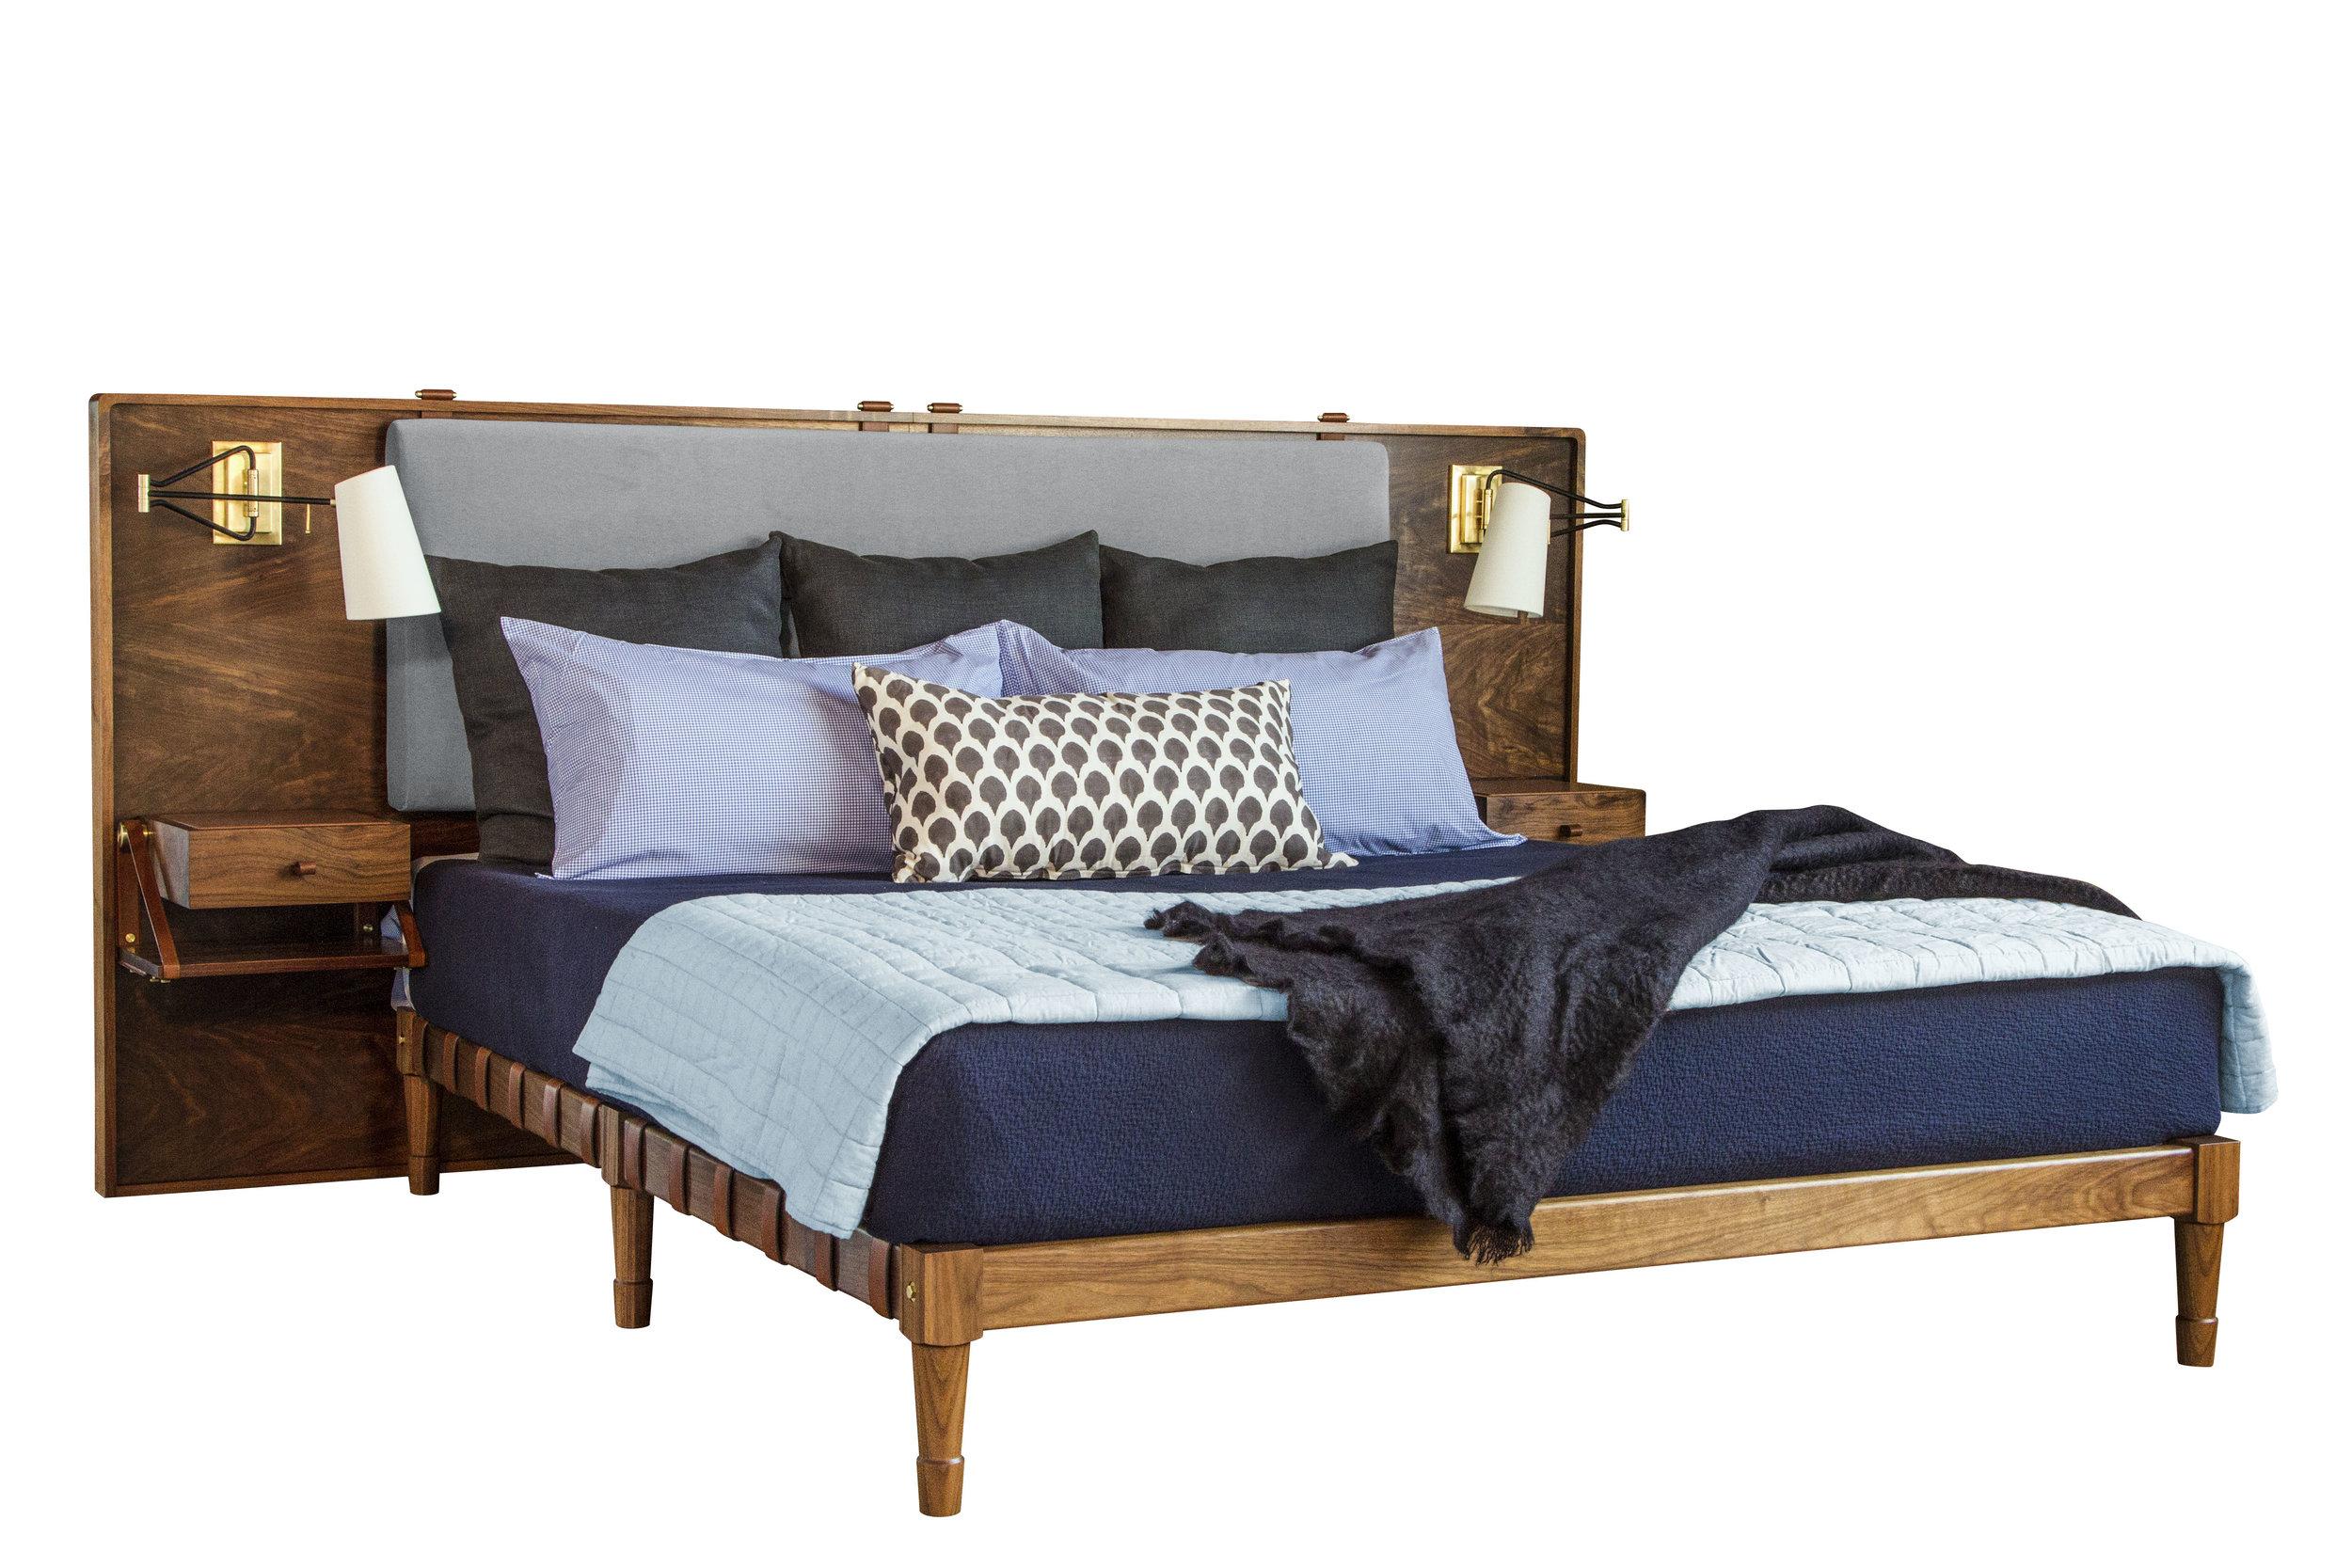 CA King Jasper Bed with Marlton Headboard